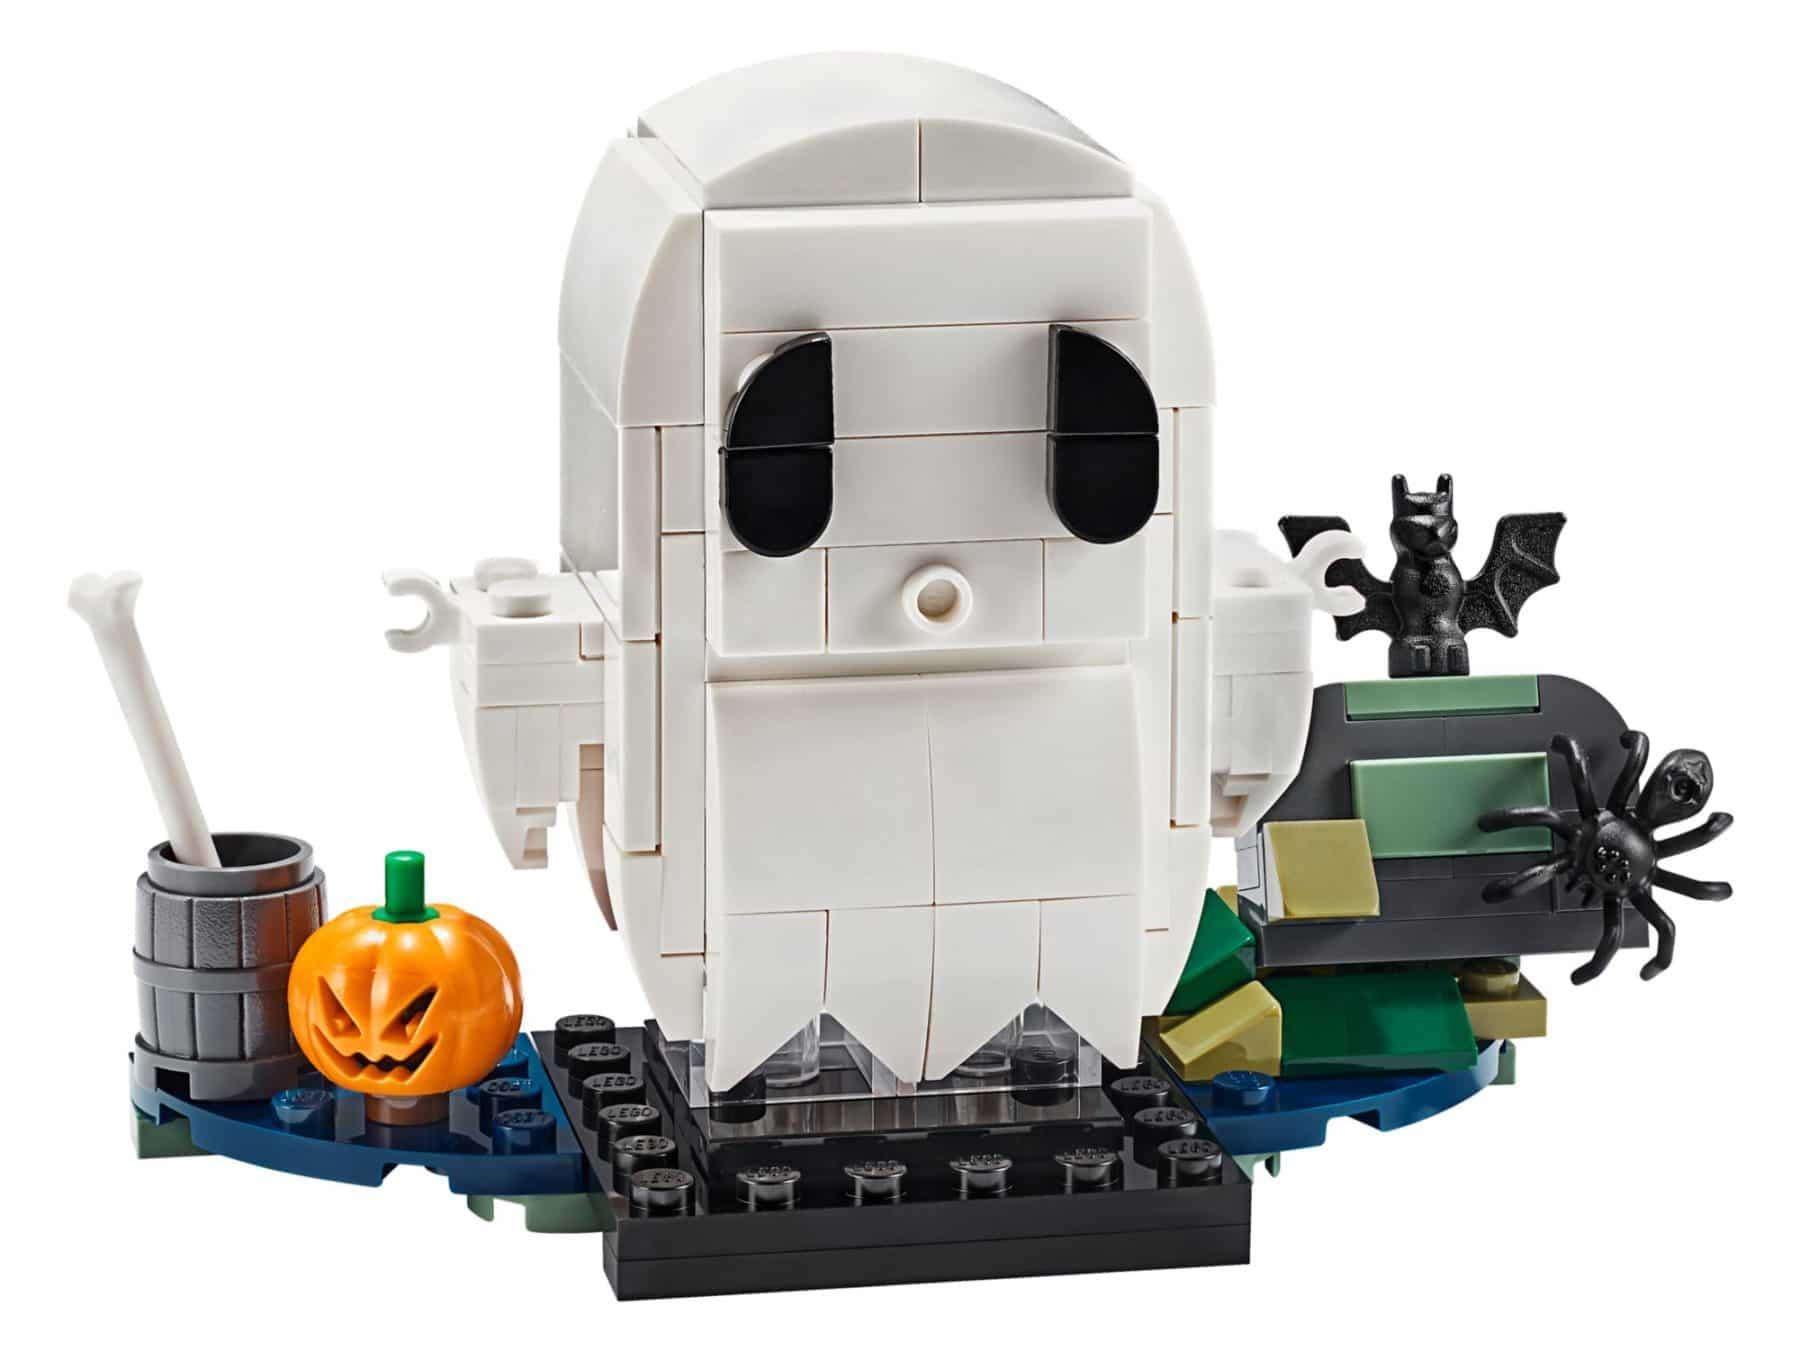 LEGO 40351 Geist BrickHeadz